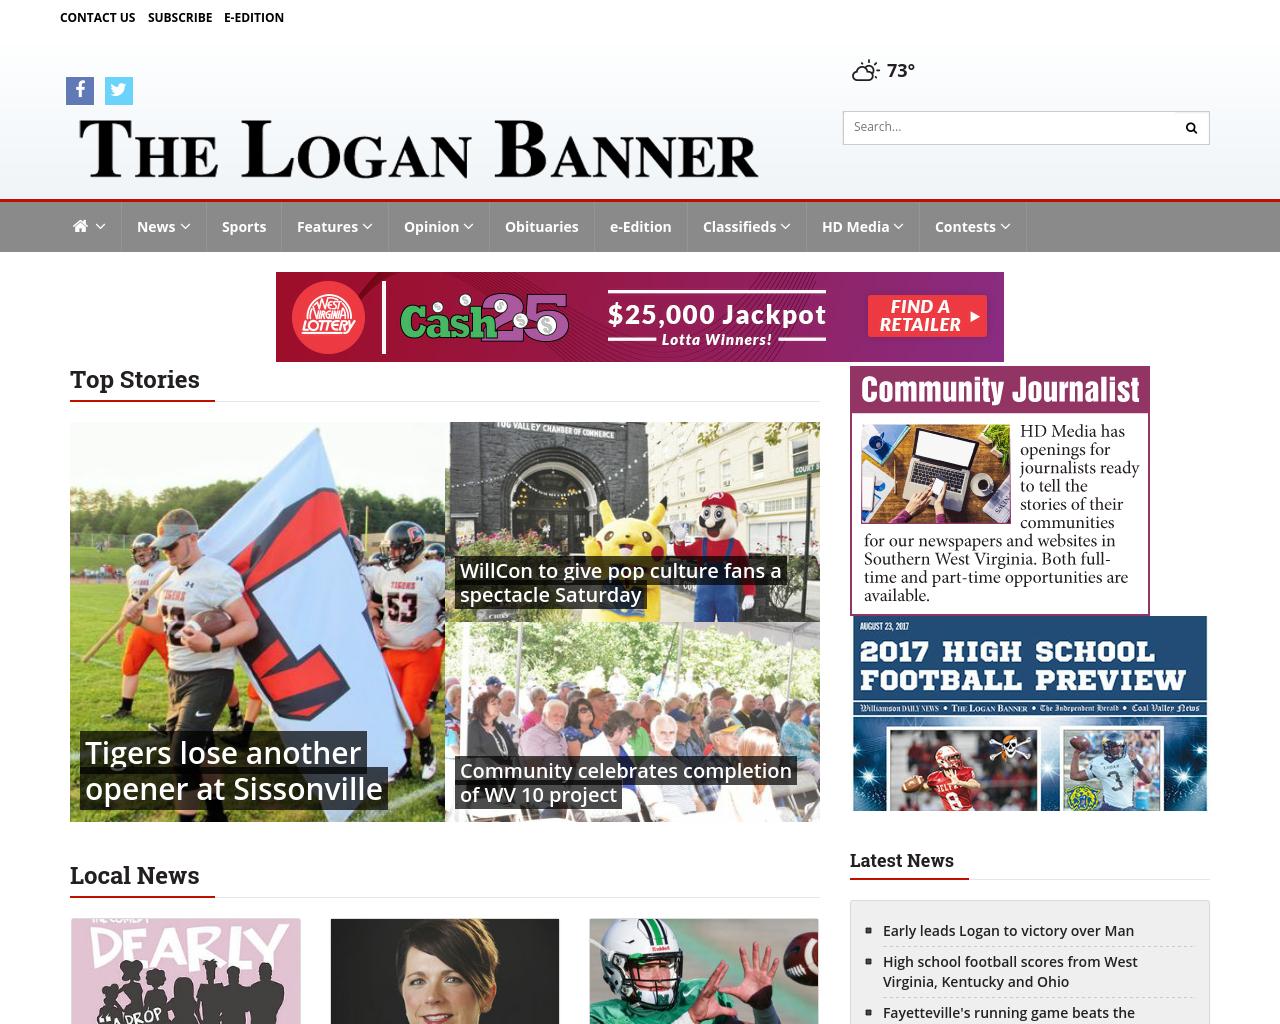 The-Logan-Banner-Advertising-Reviews-Pricing